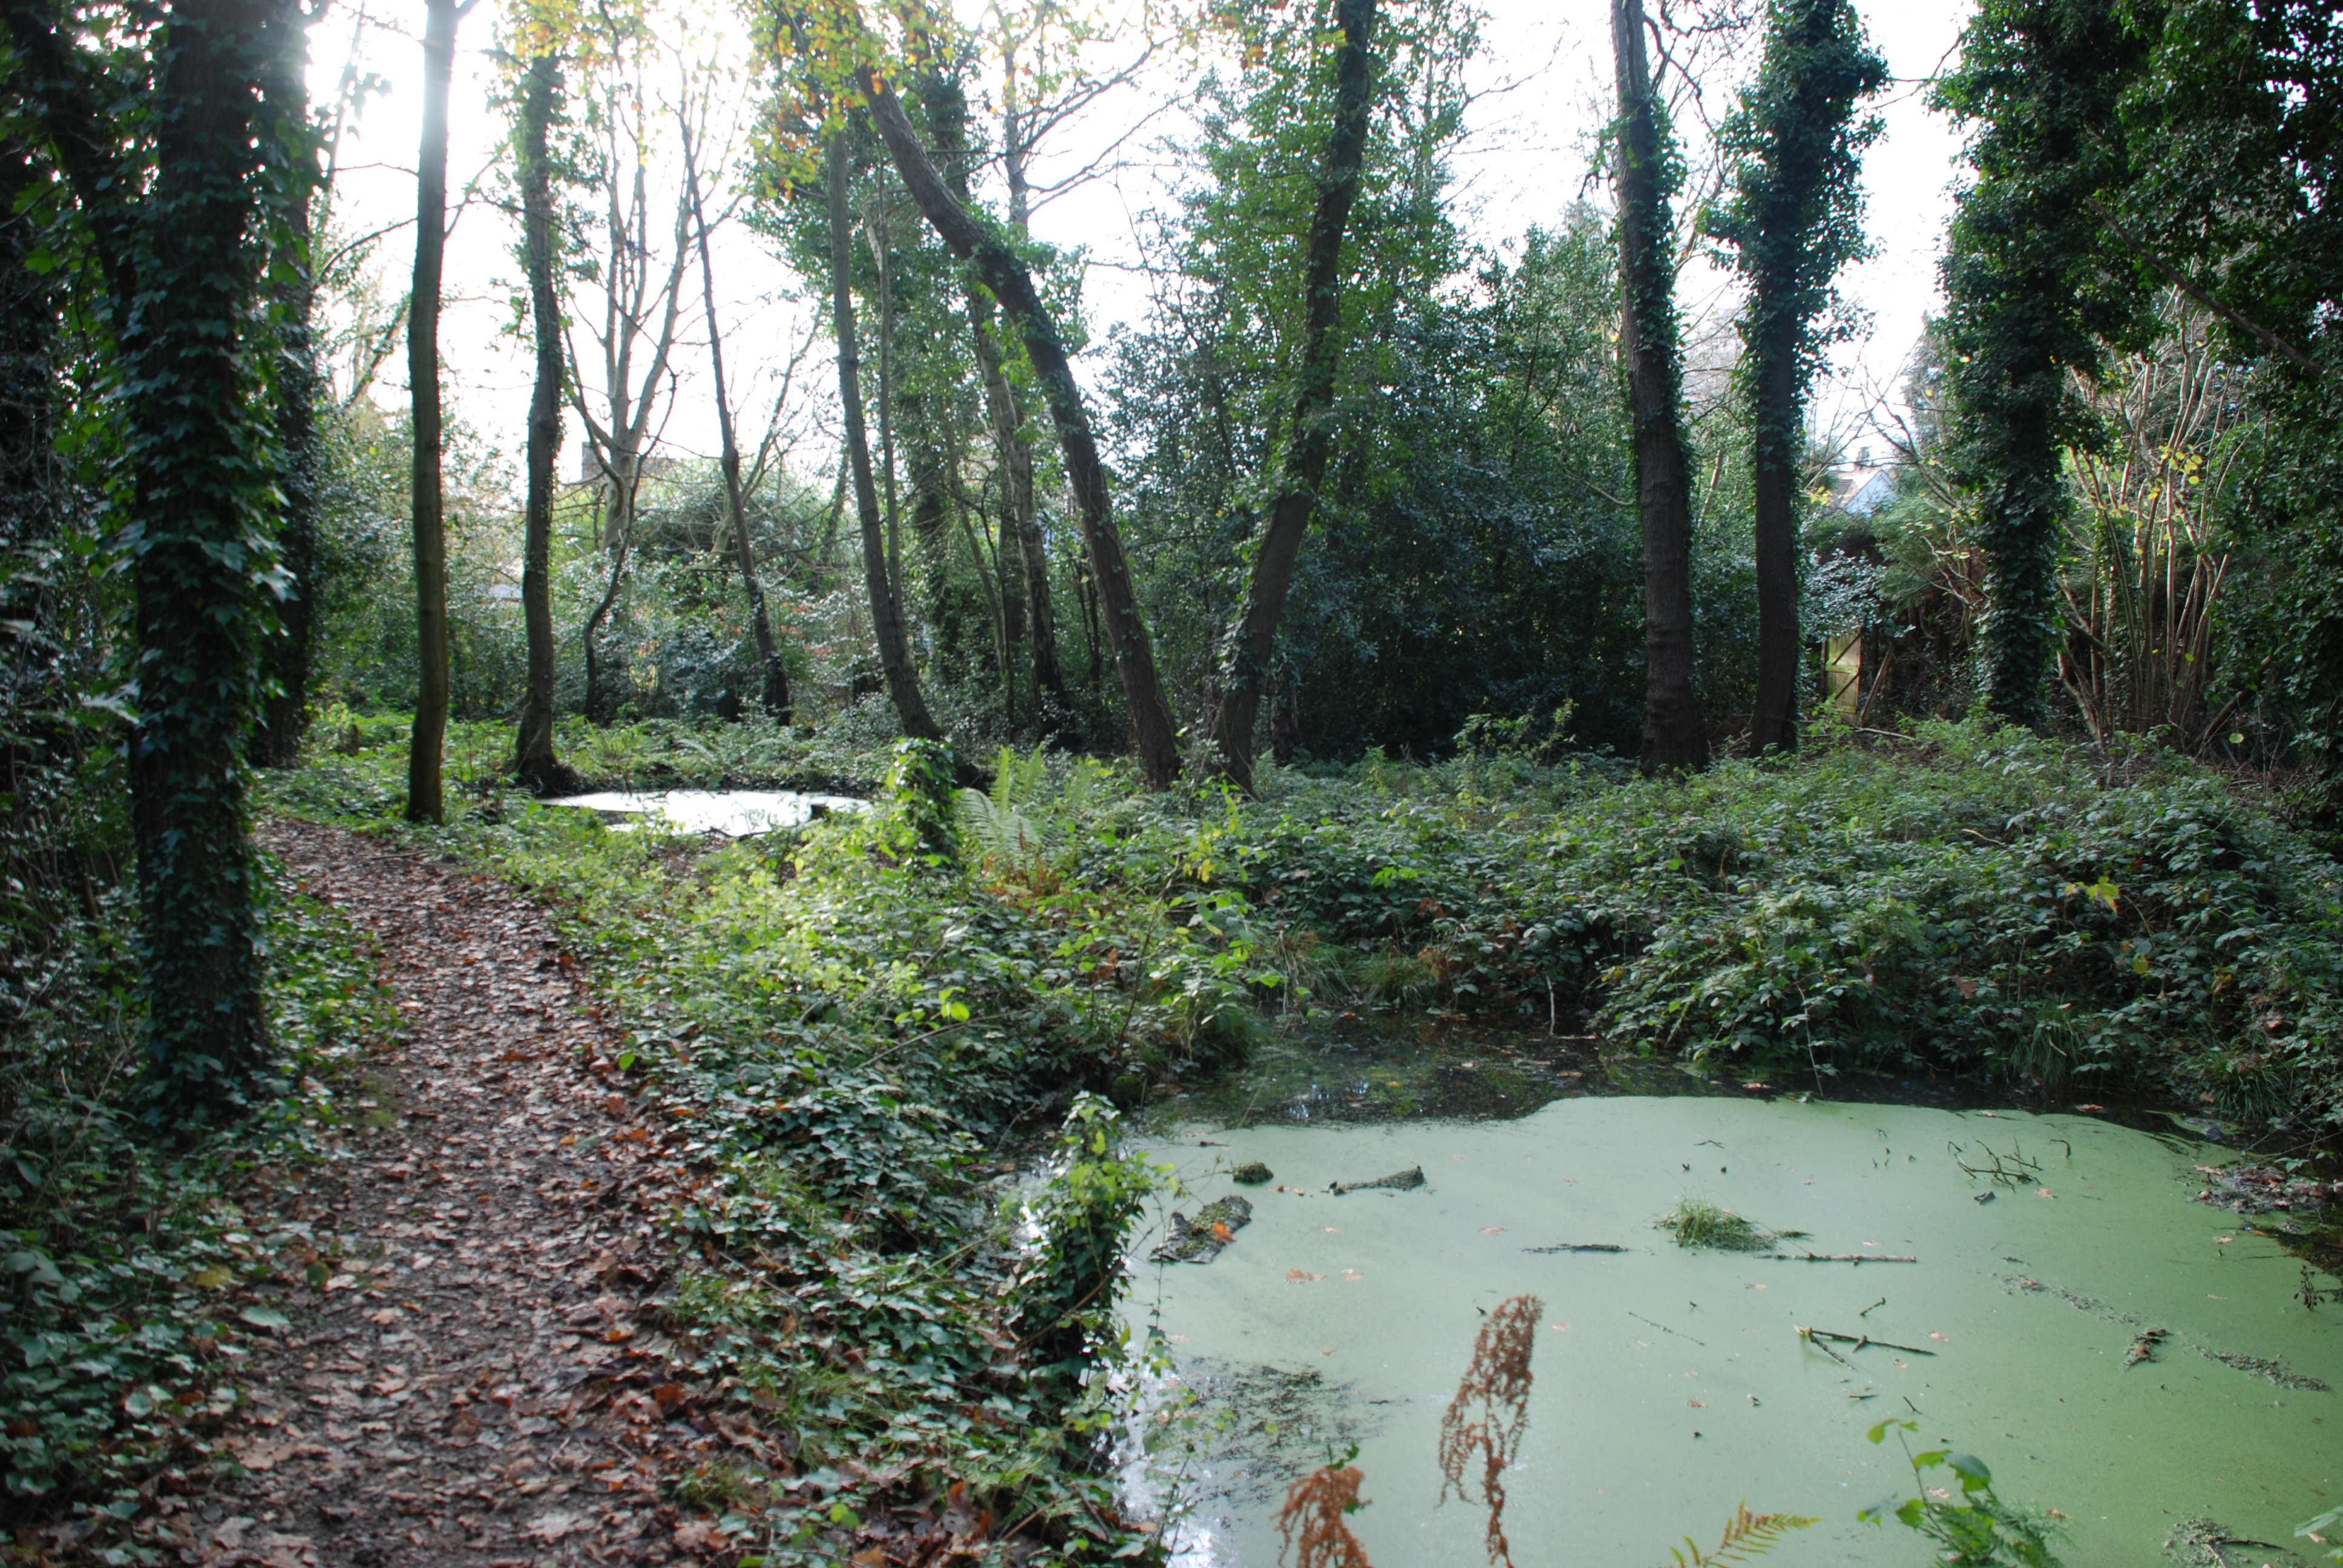 The smaller ponds in December 2009